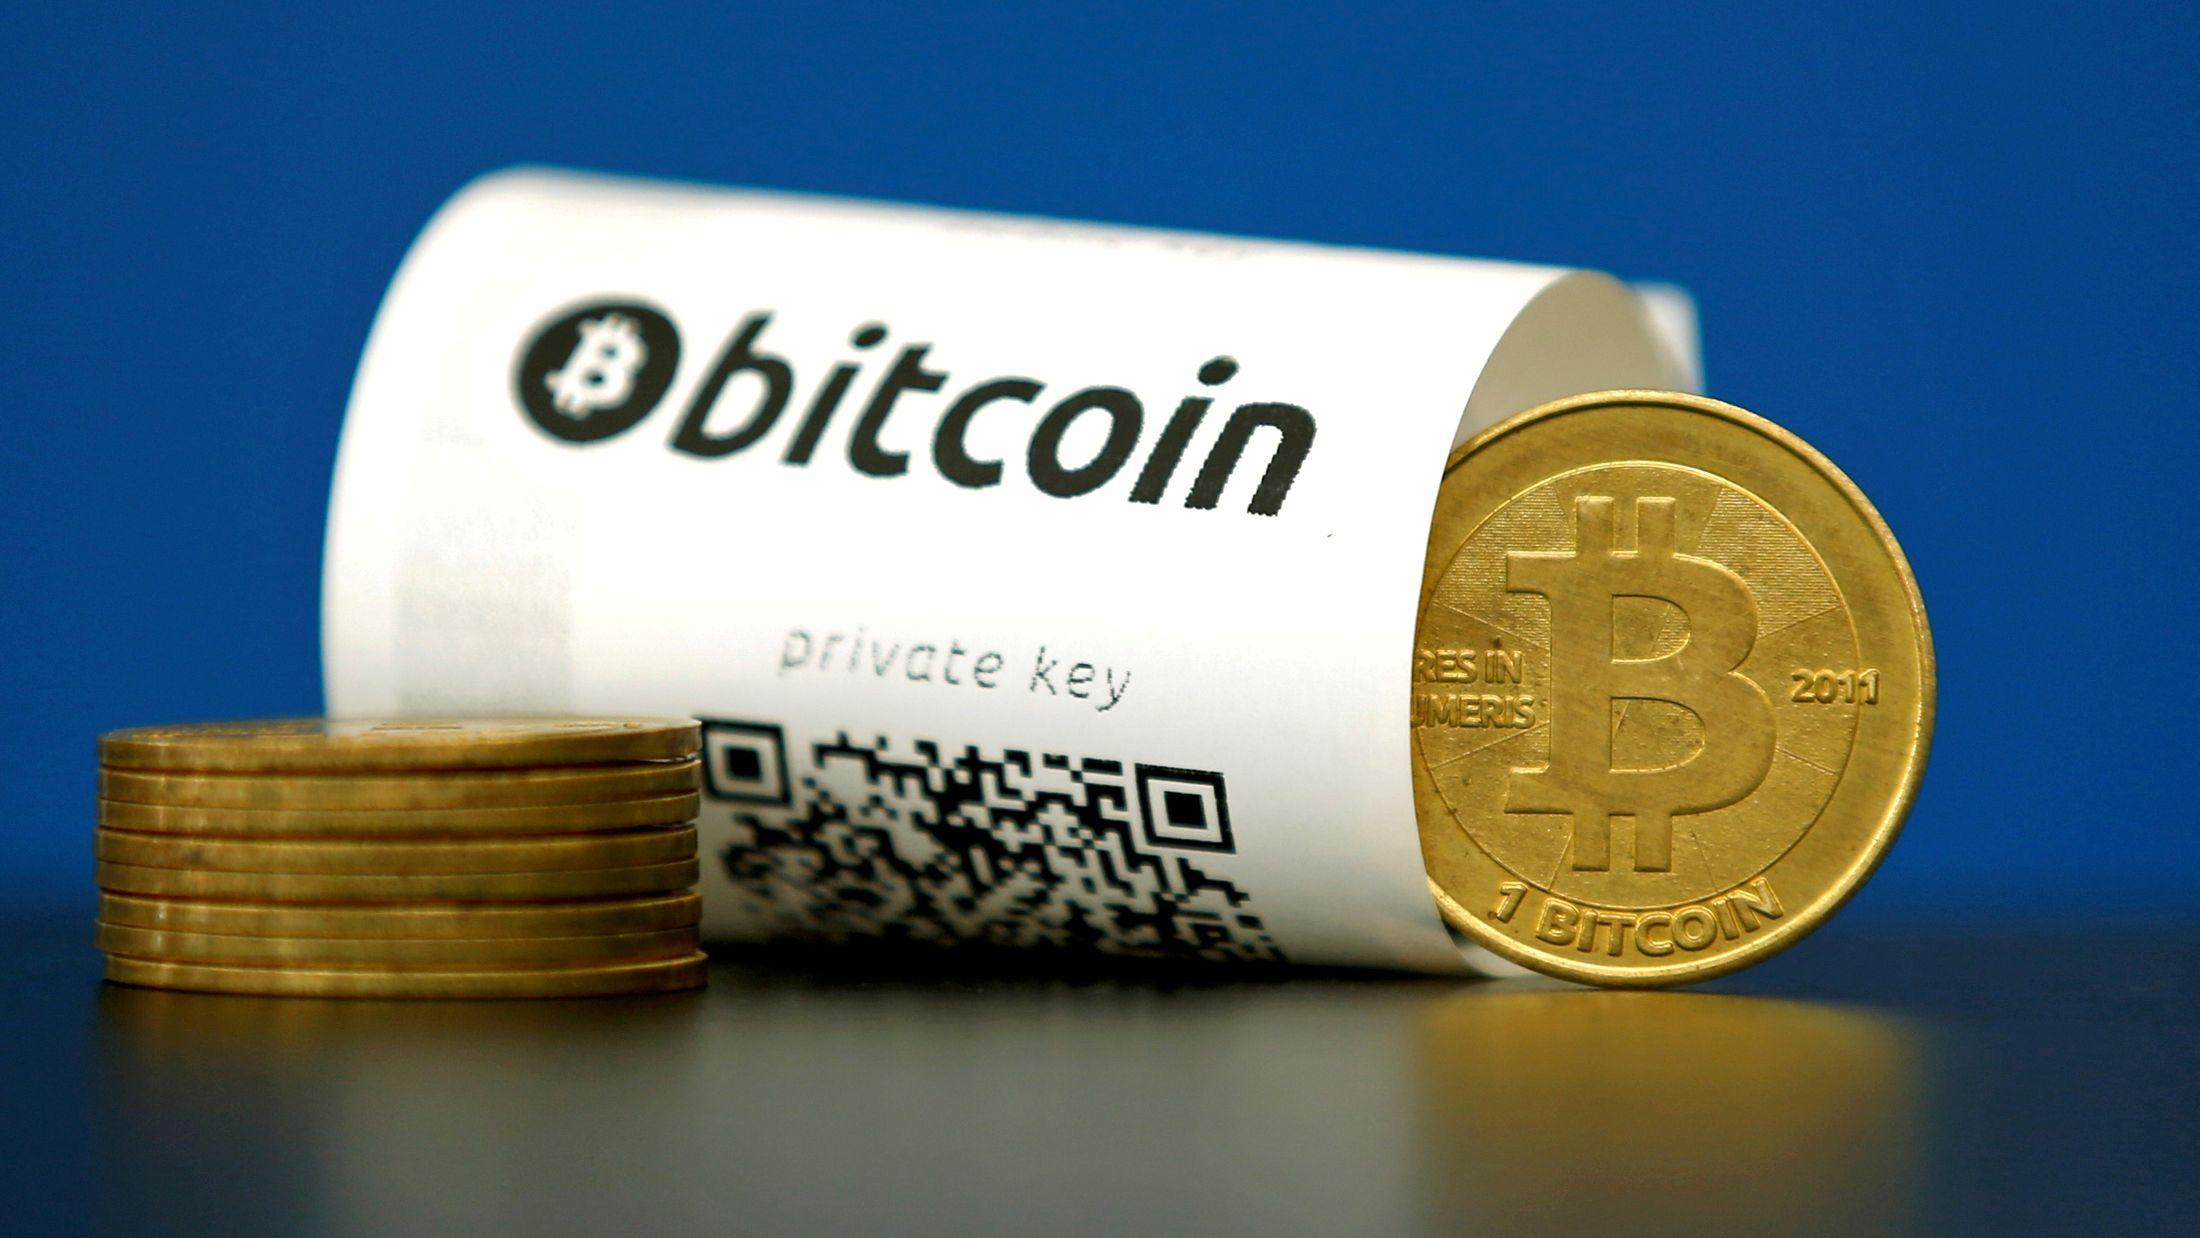 new coins like bitcoin